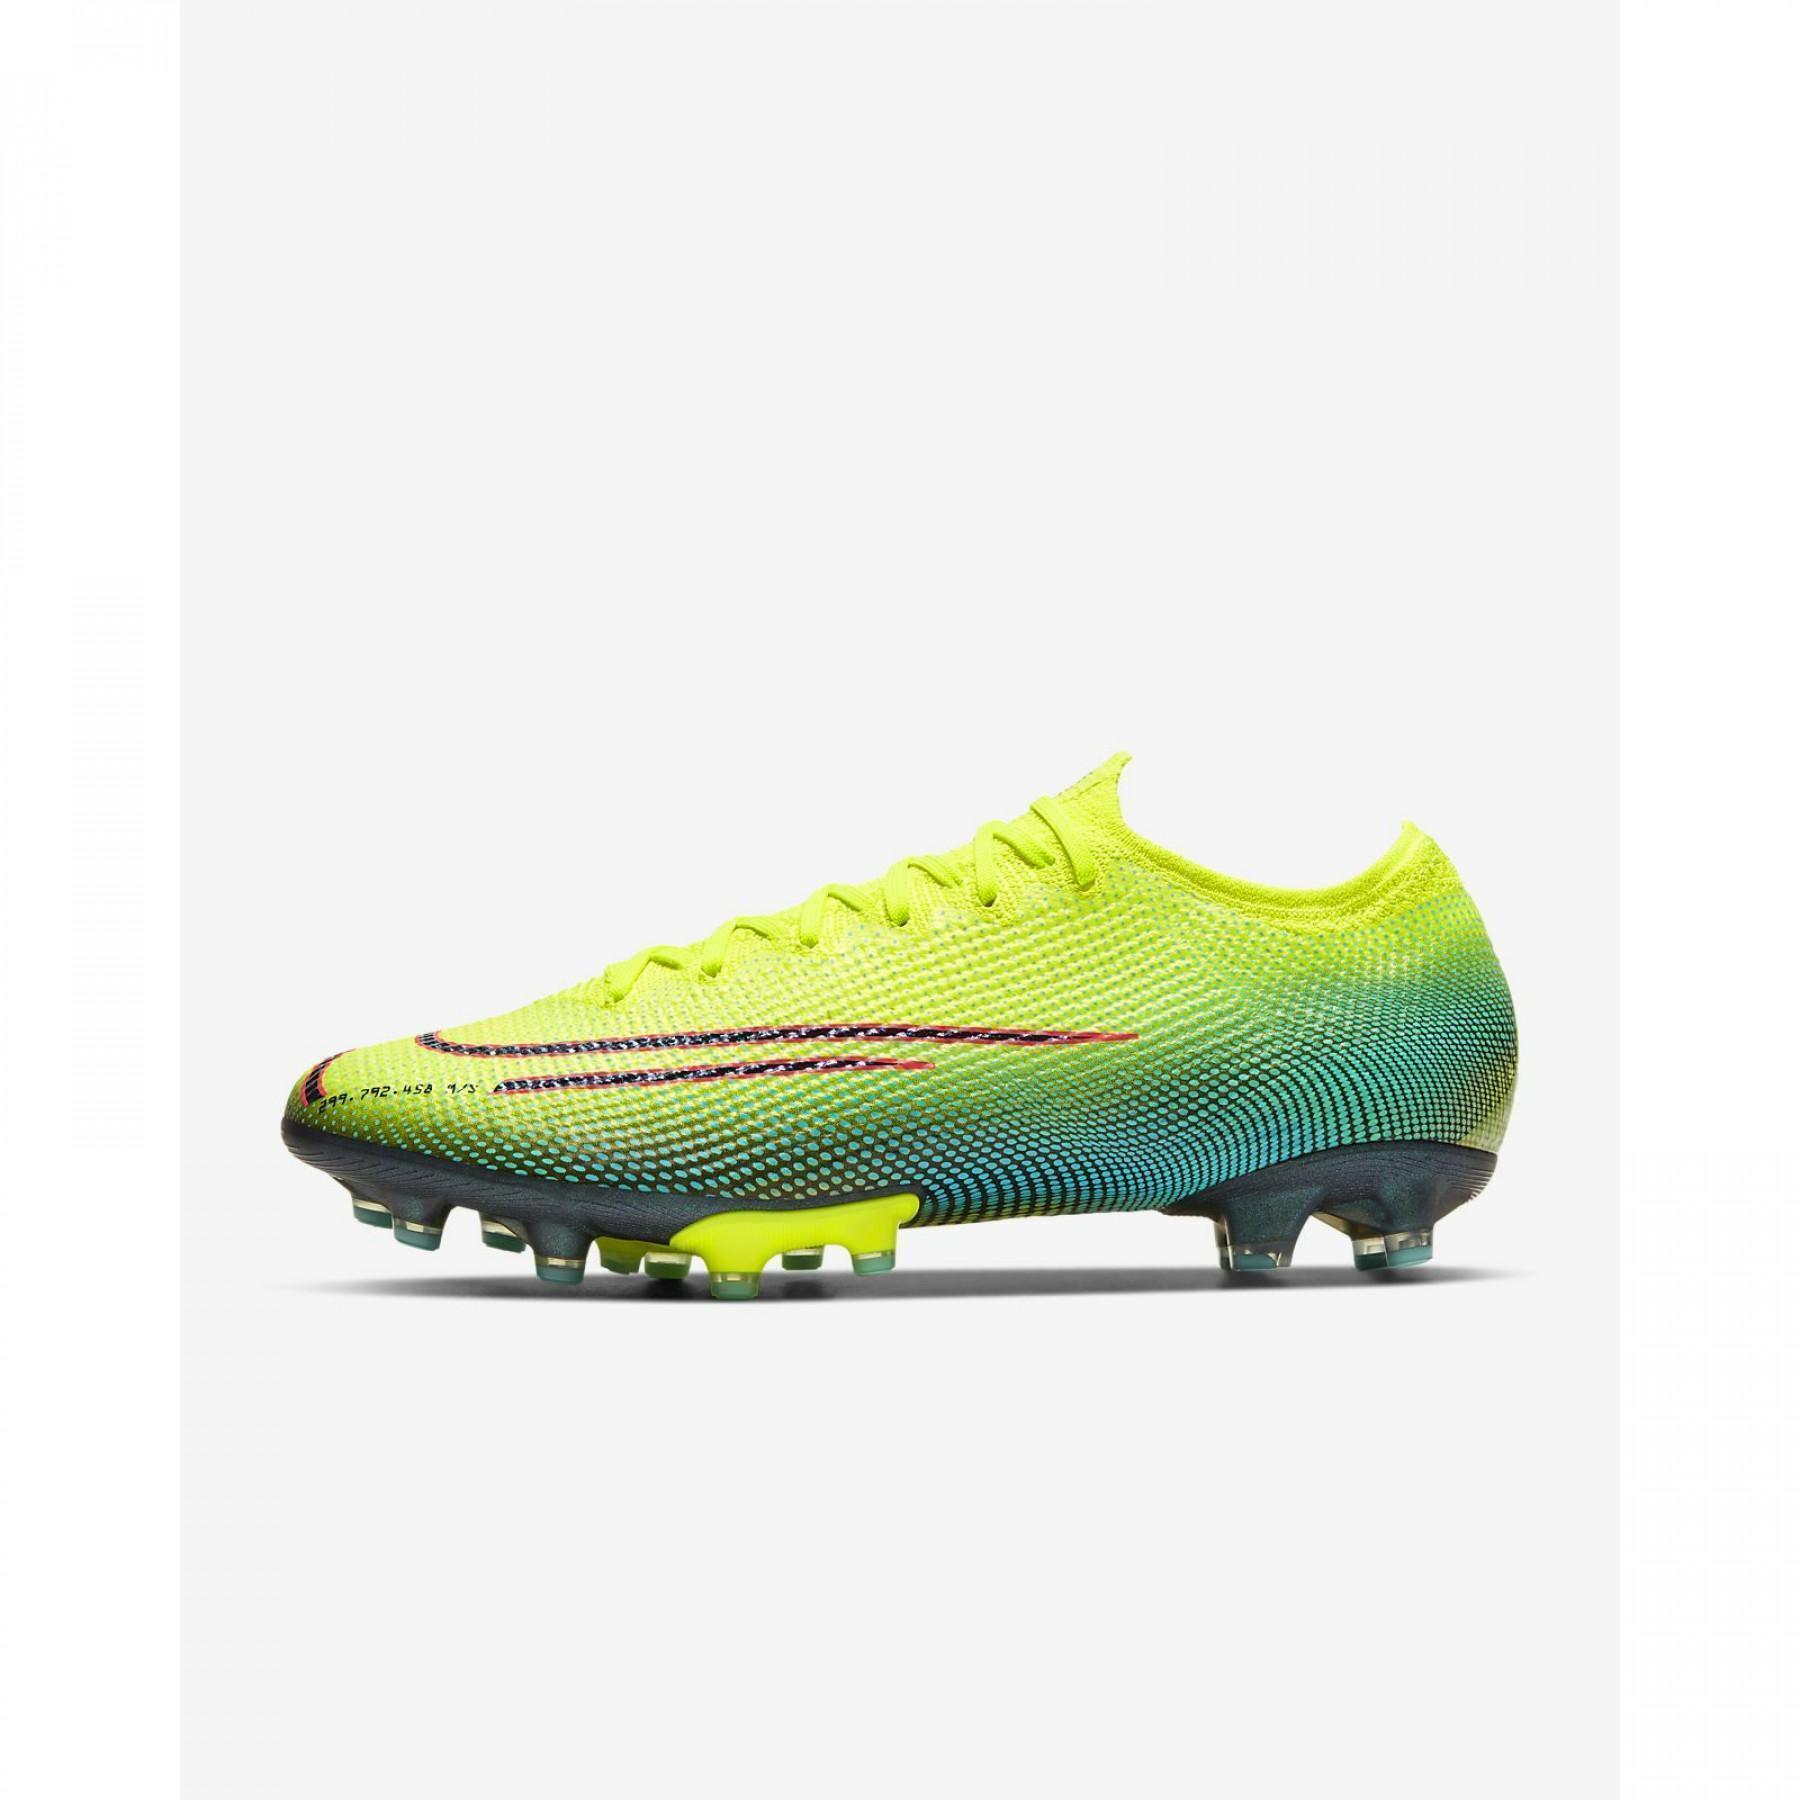 Chaussures Nike Mercurial Vapor 13 Elite MDS Pro AG